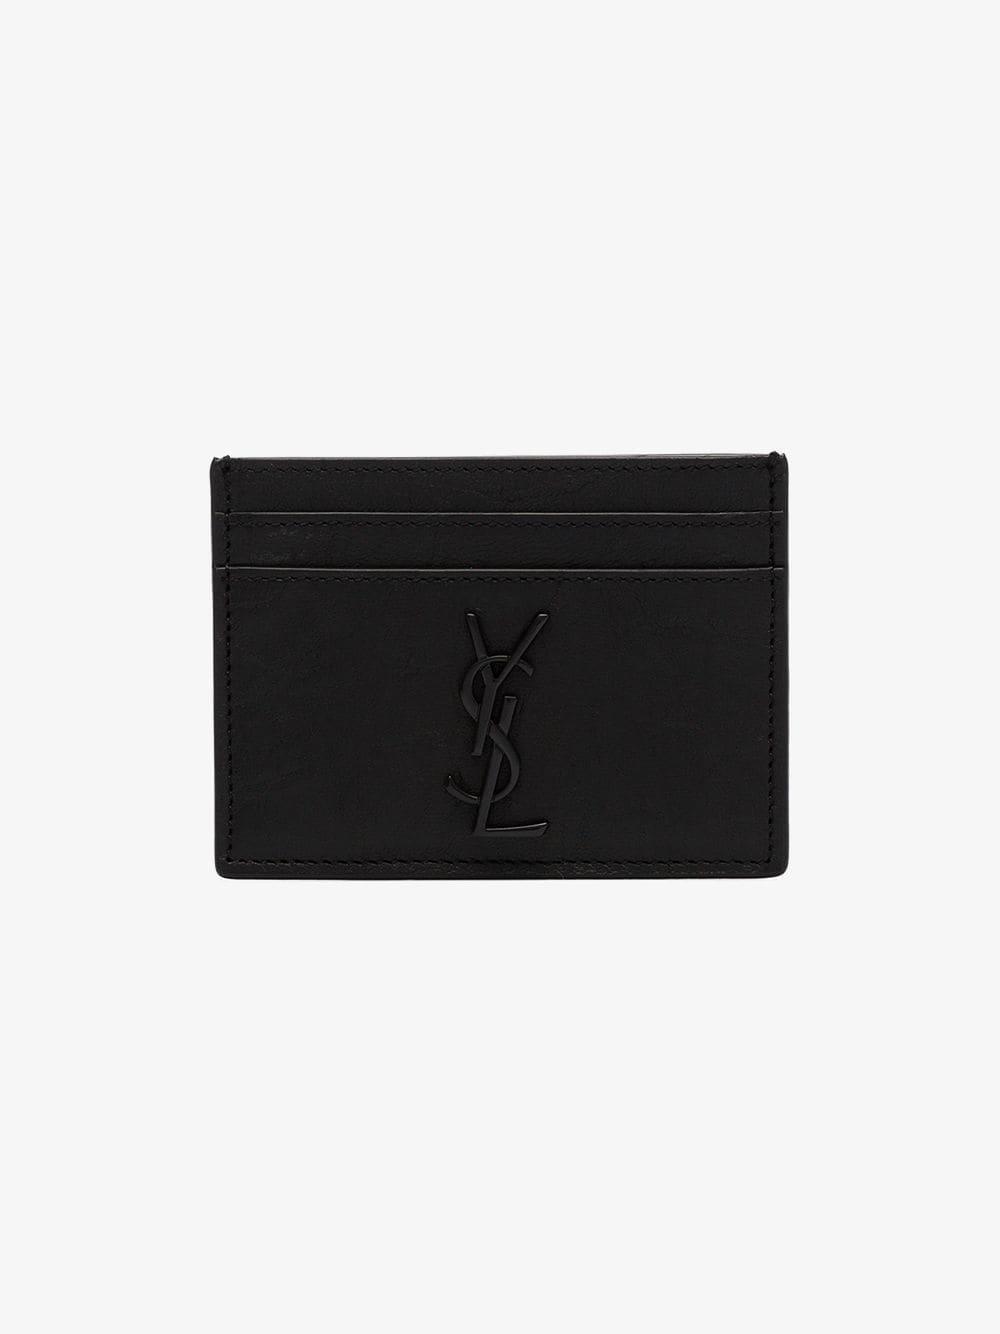 54d345df026 Saint Laurent Black Crocodile Embossed Leather Cardholder in Black ...